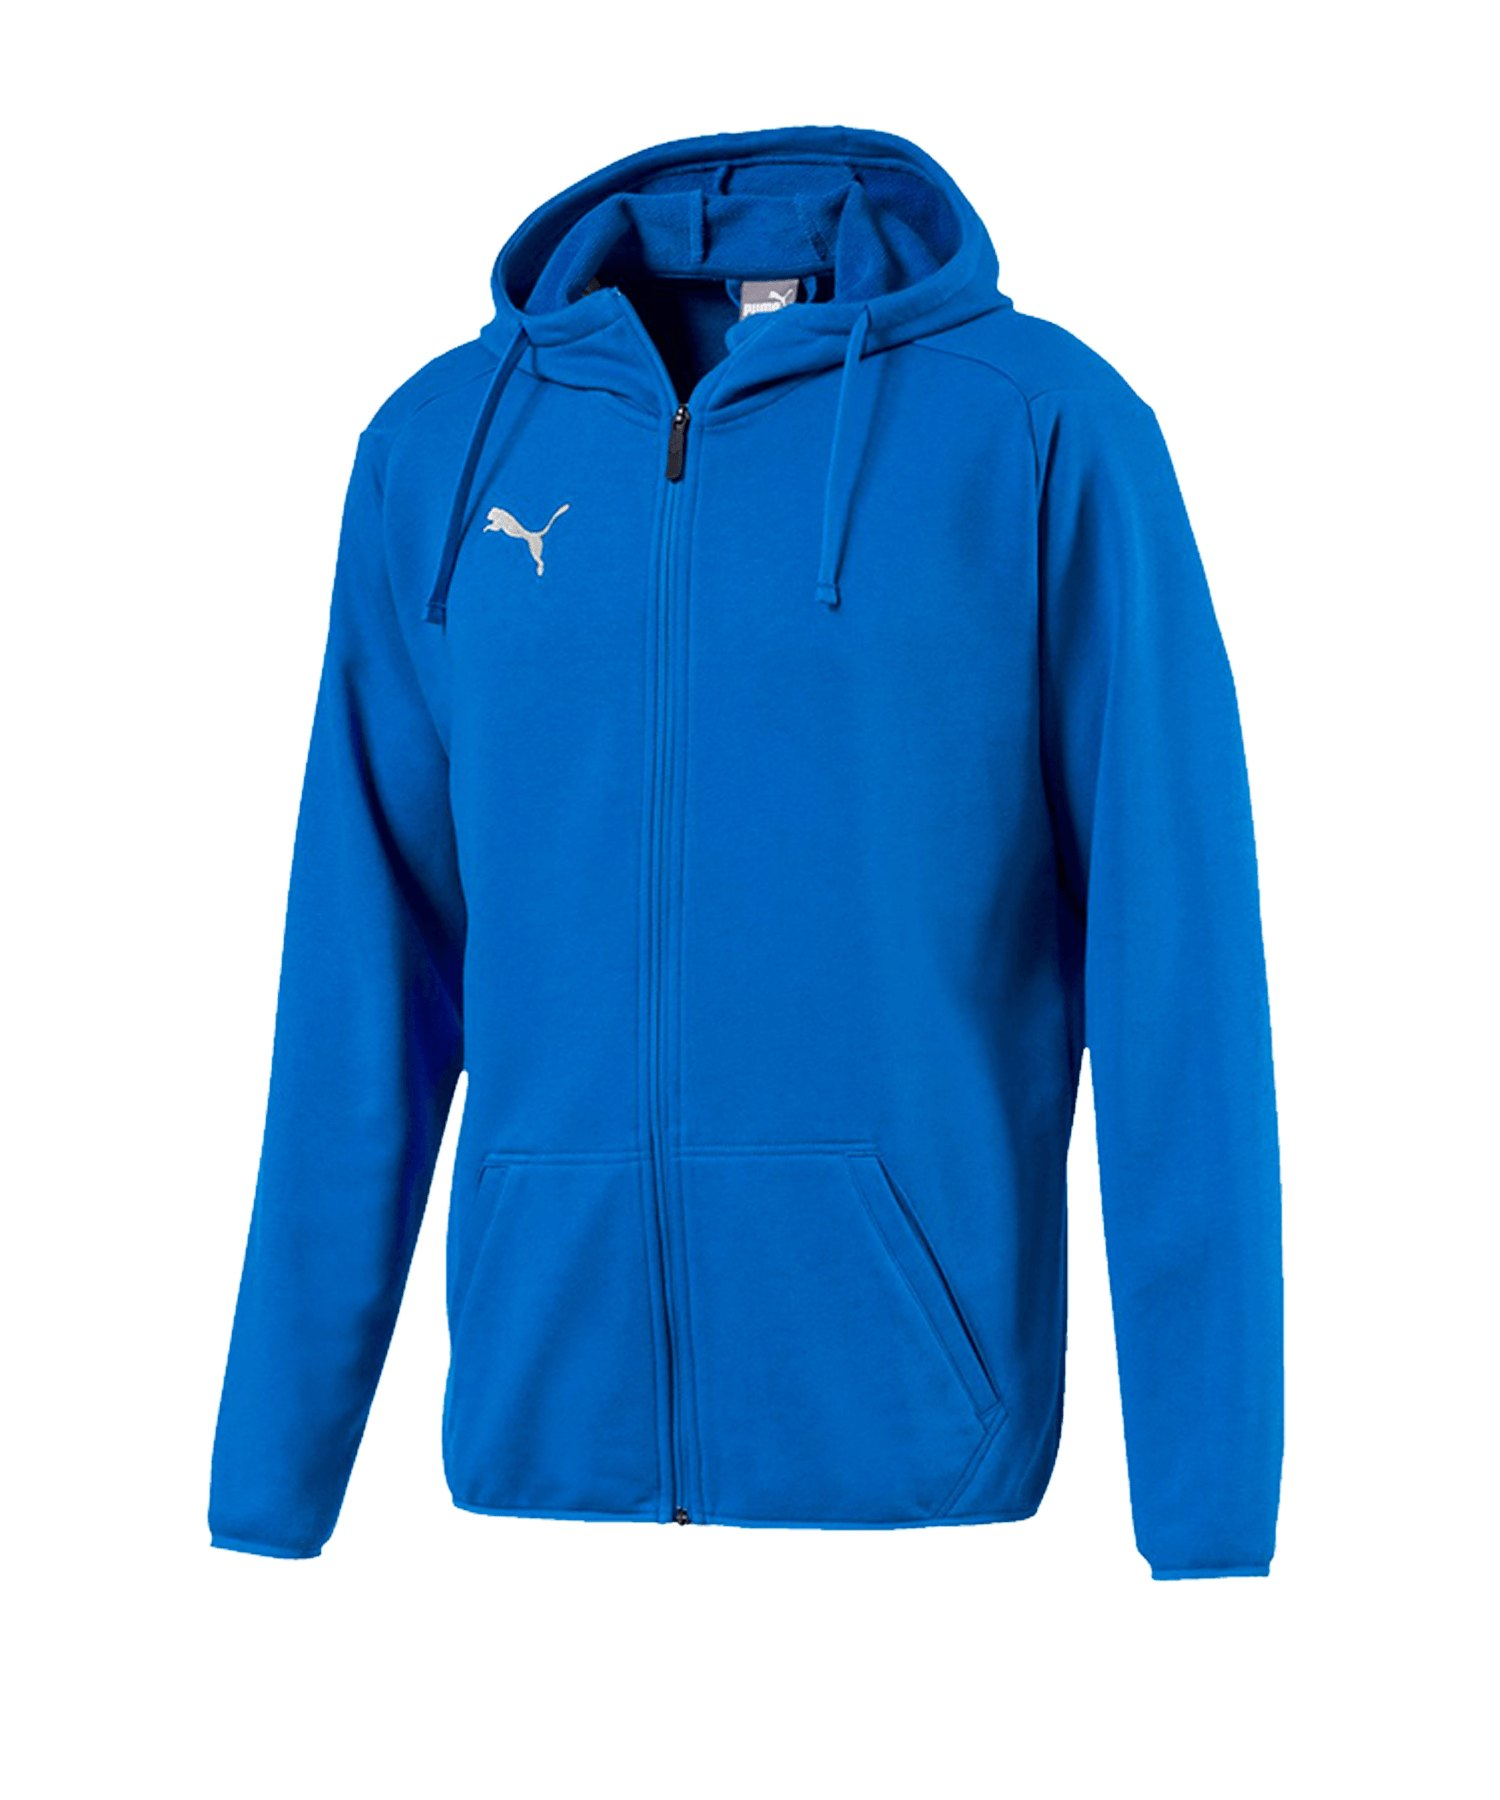 PUMA LIGA Casual Jacket Jacke Blau F02 - blau